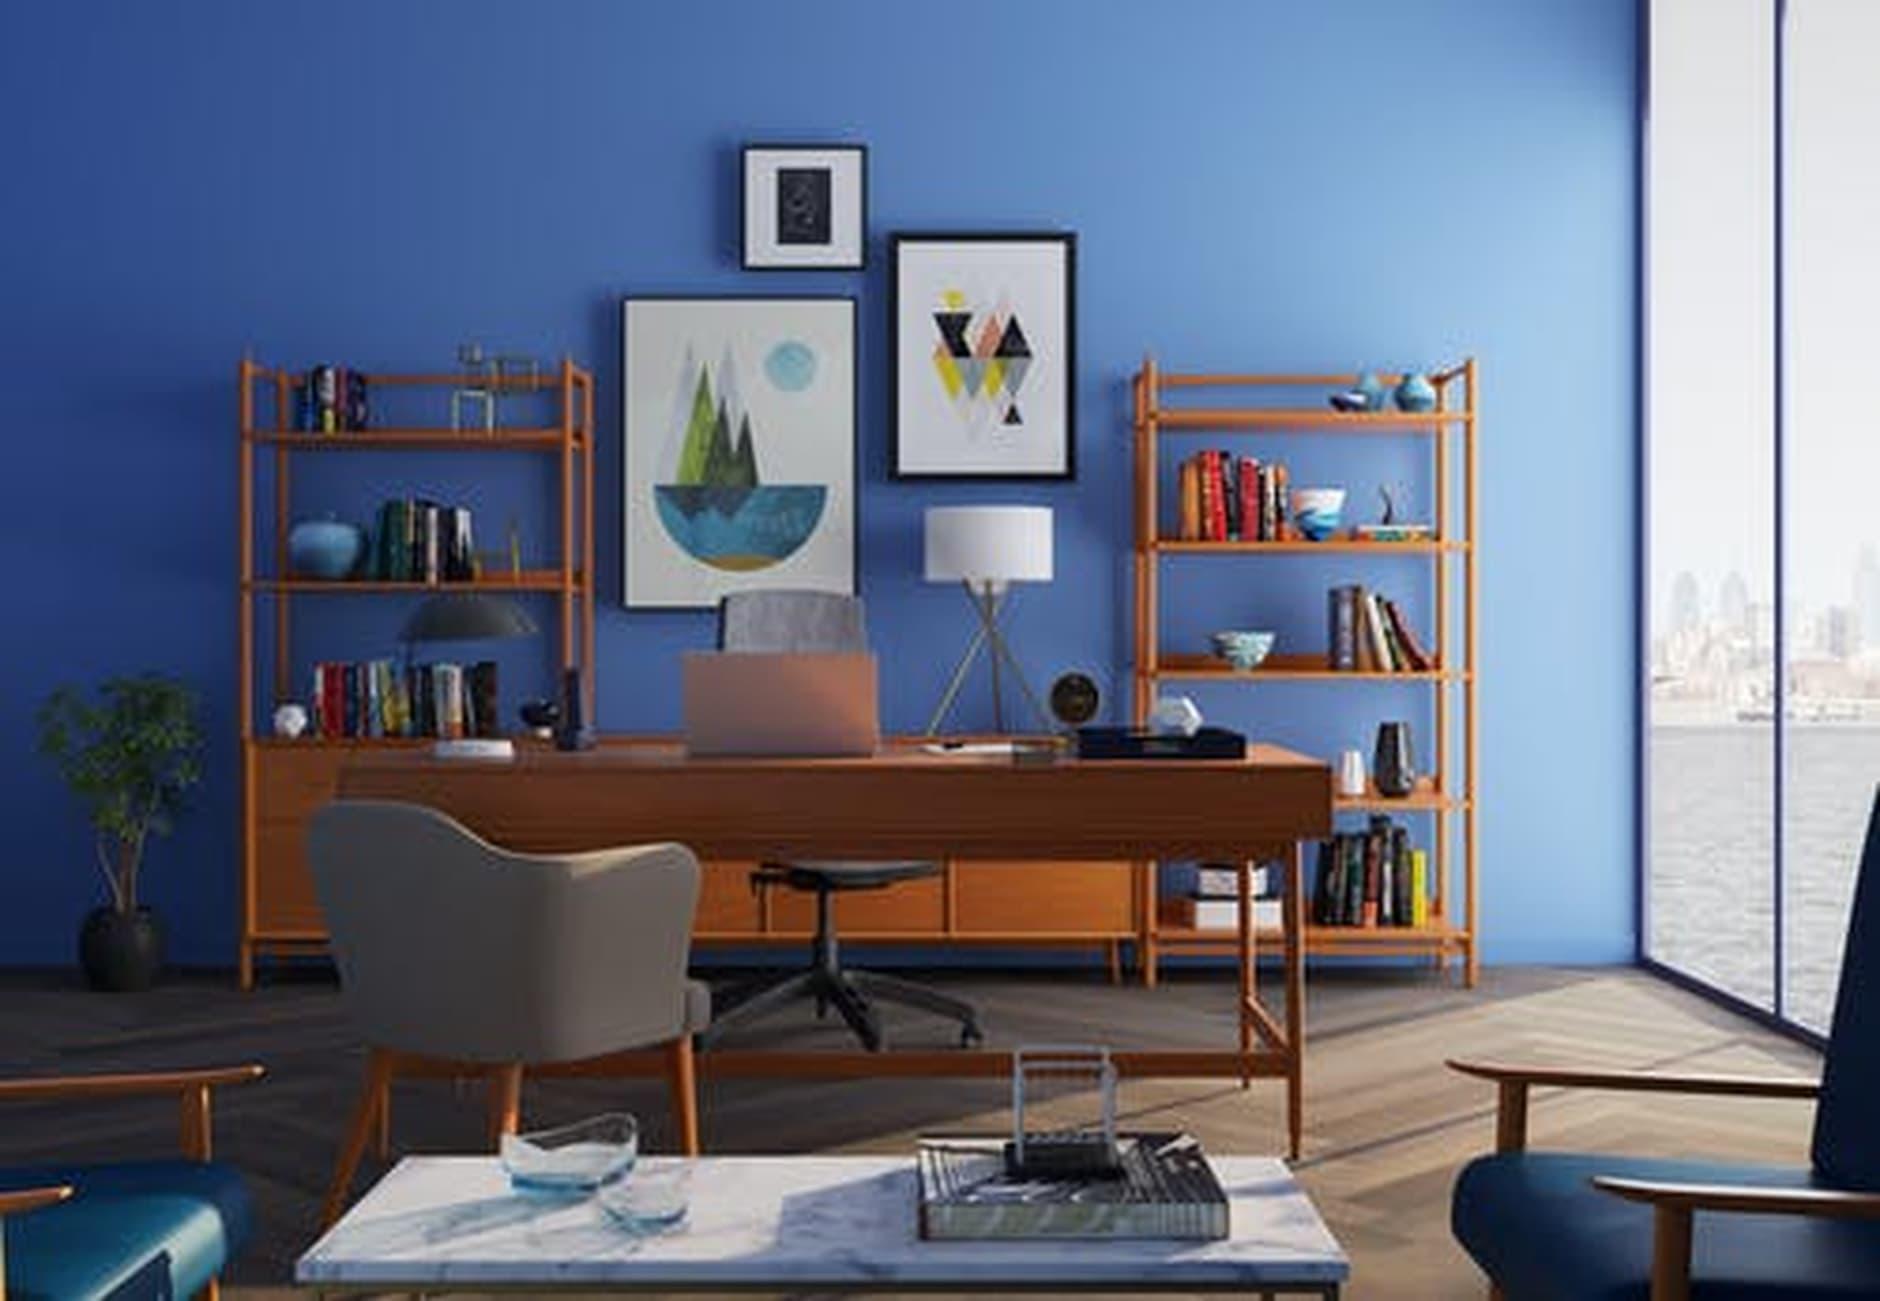 home_office_kancelaria_Doma_stol_kniznica_stolicka